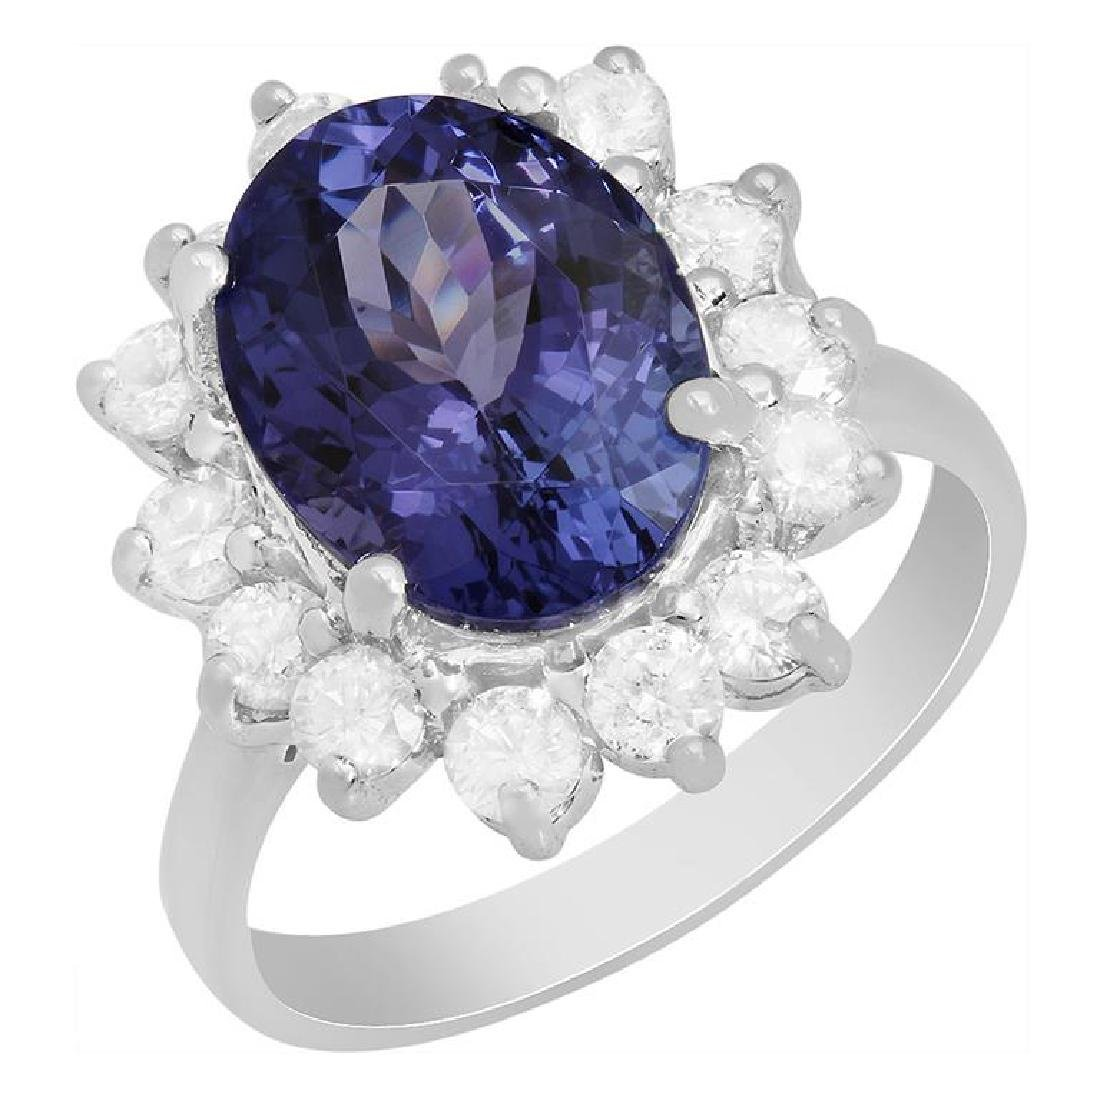 14k White Gold 5.16ct Tanzanite 1.01ct Diamond Ring